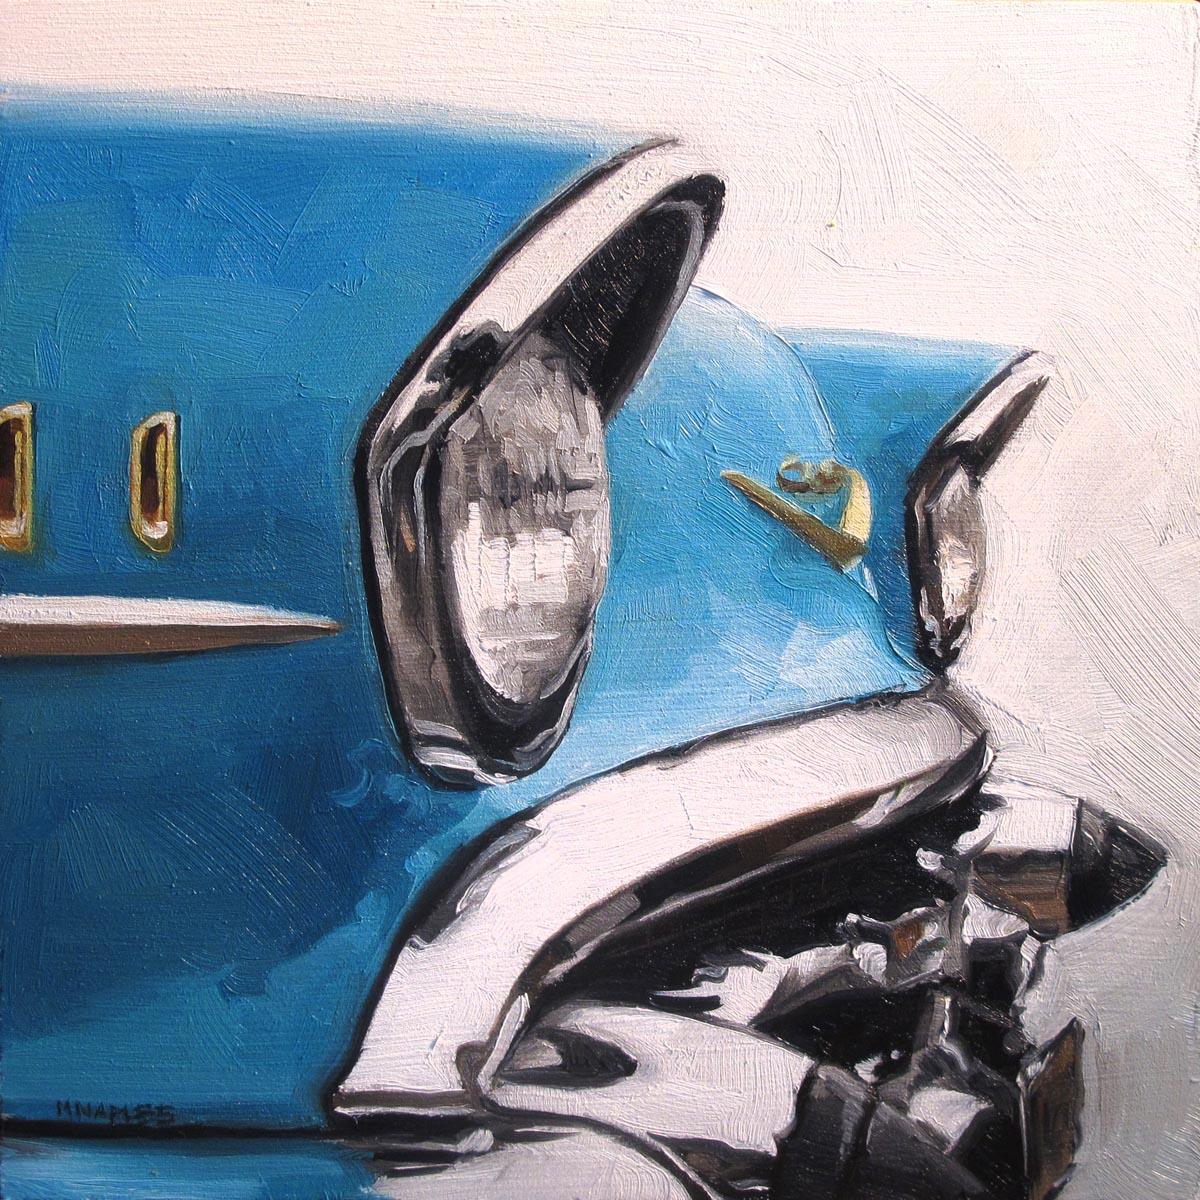 """57 Bel Air"" original fine art by Michael Naples"